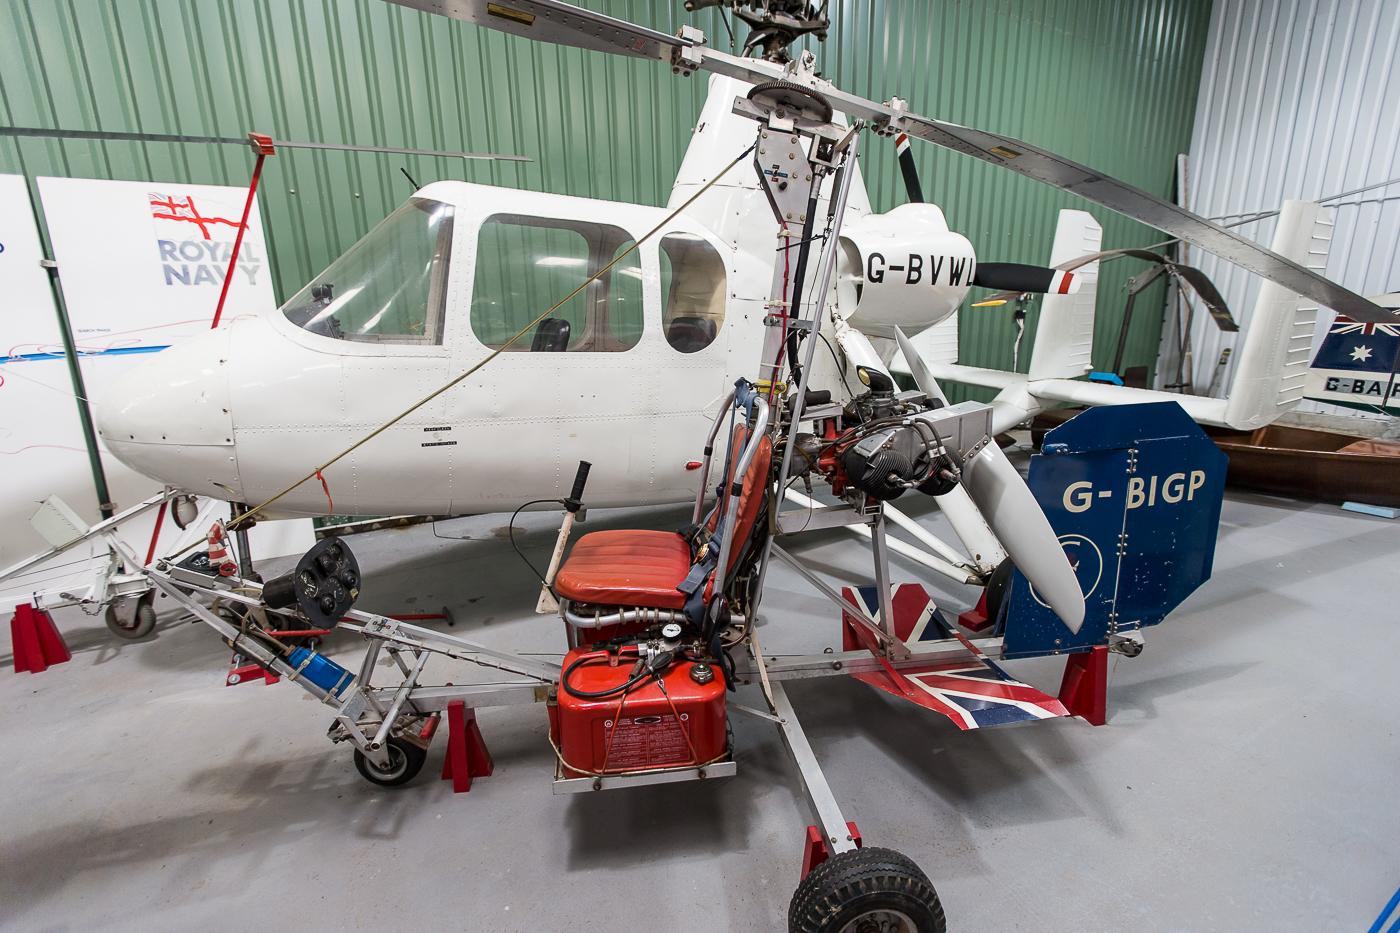 2d alloy helicopter инструкция на русском языке